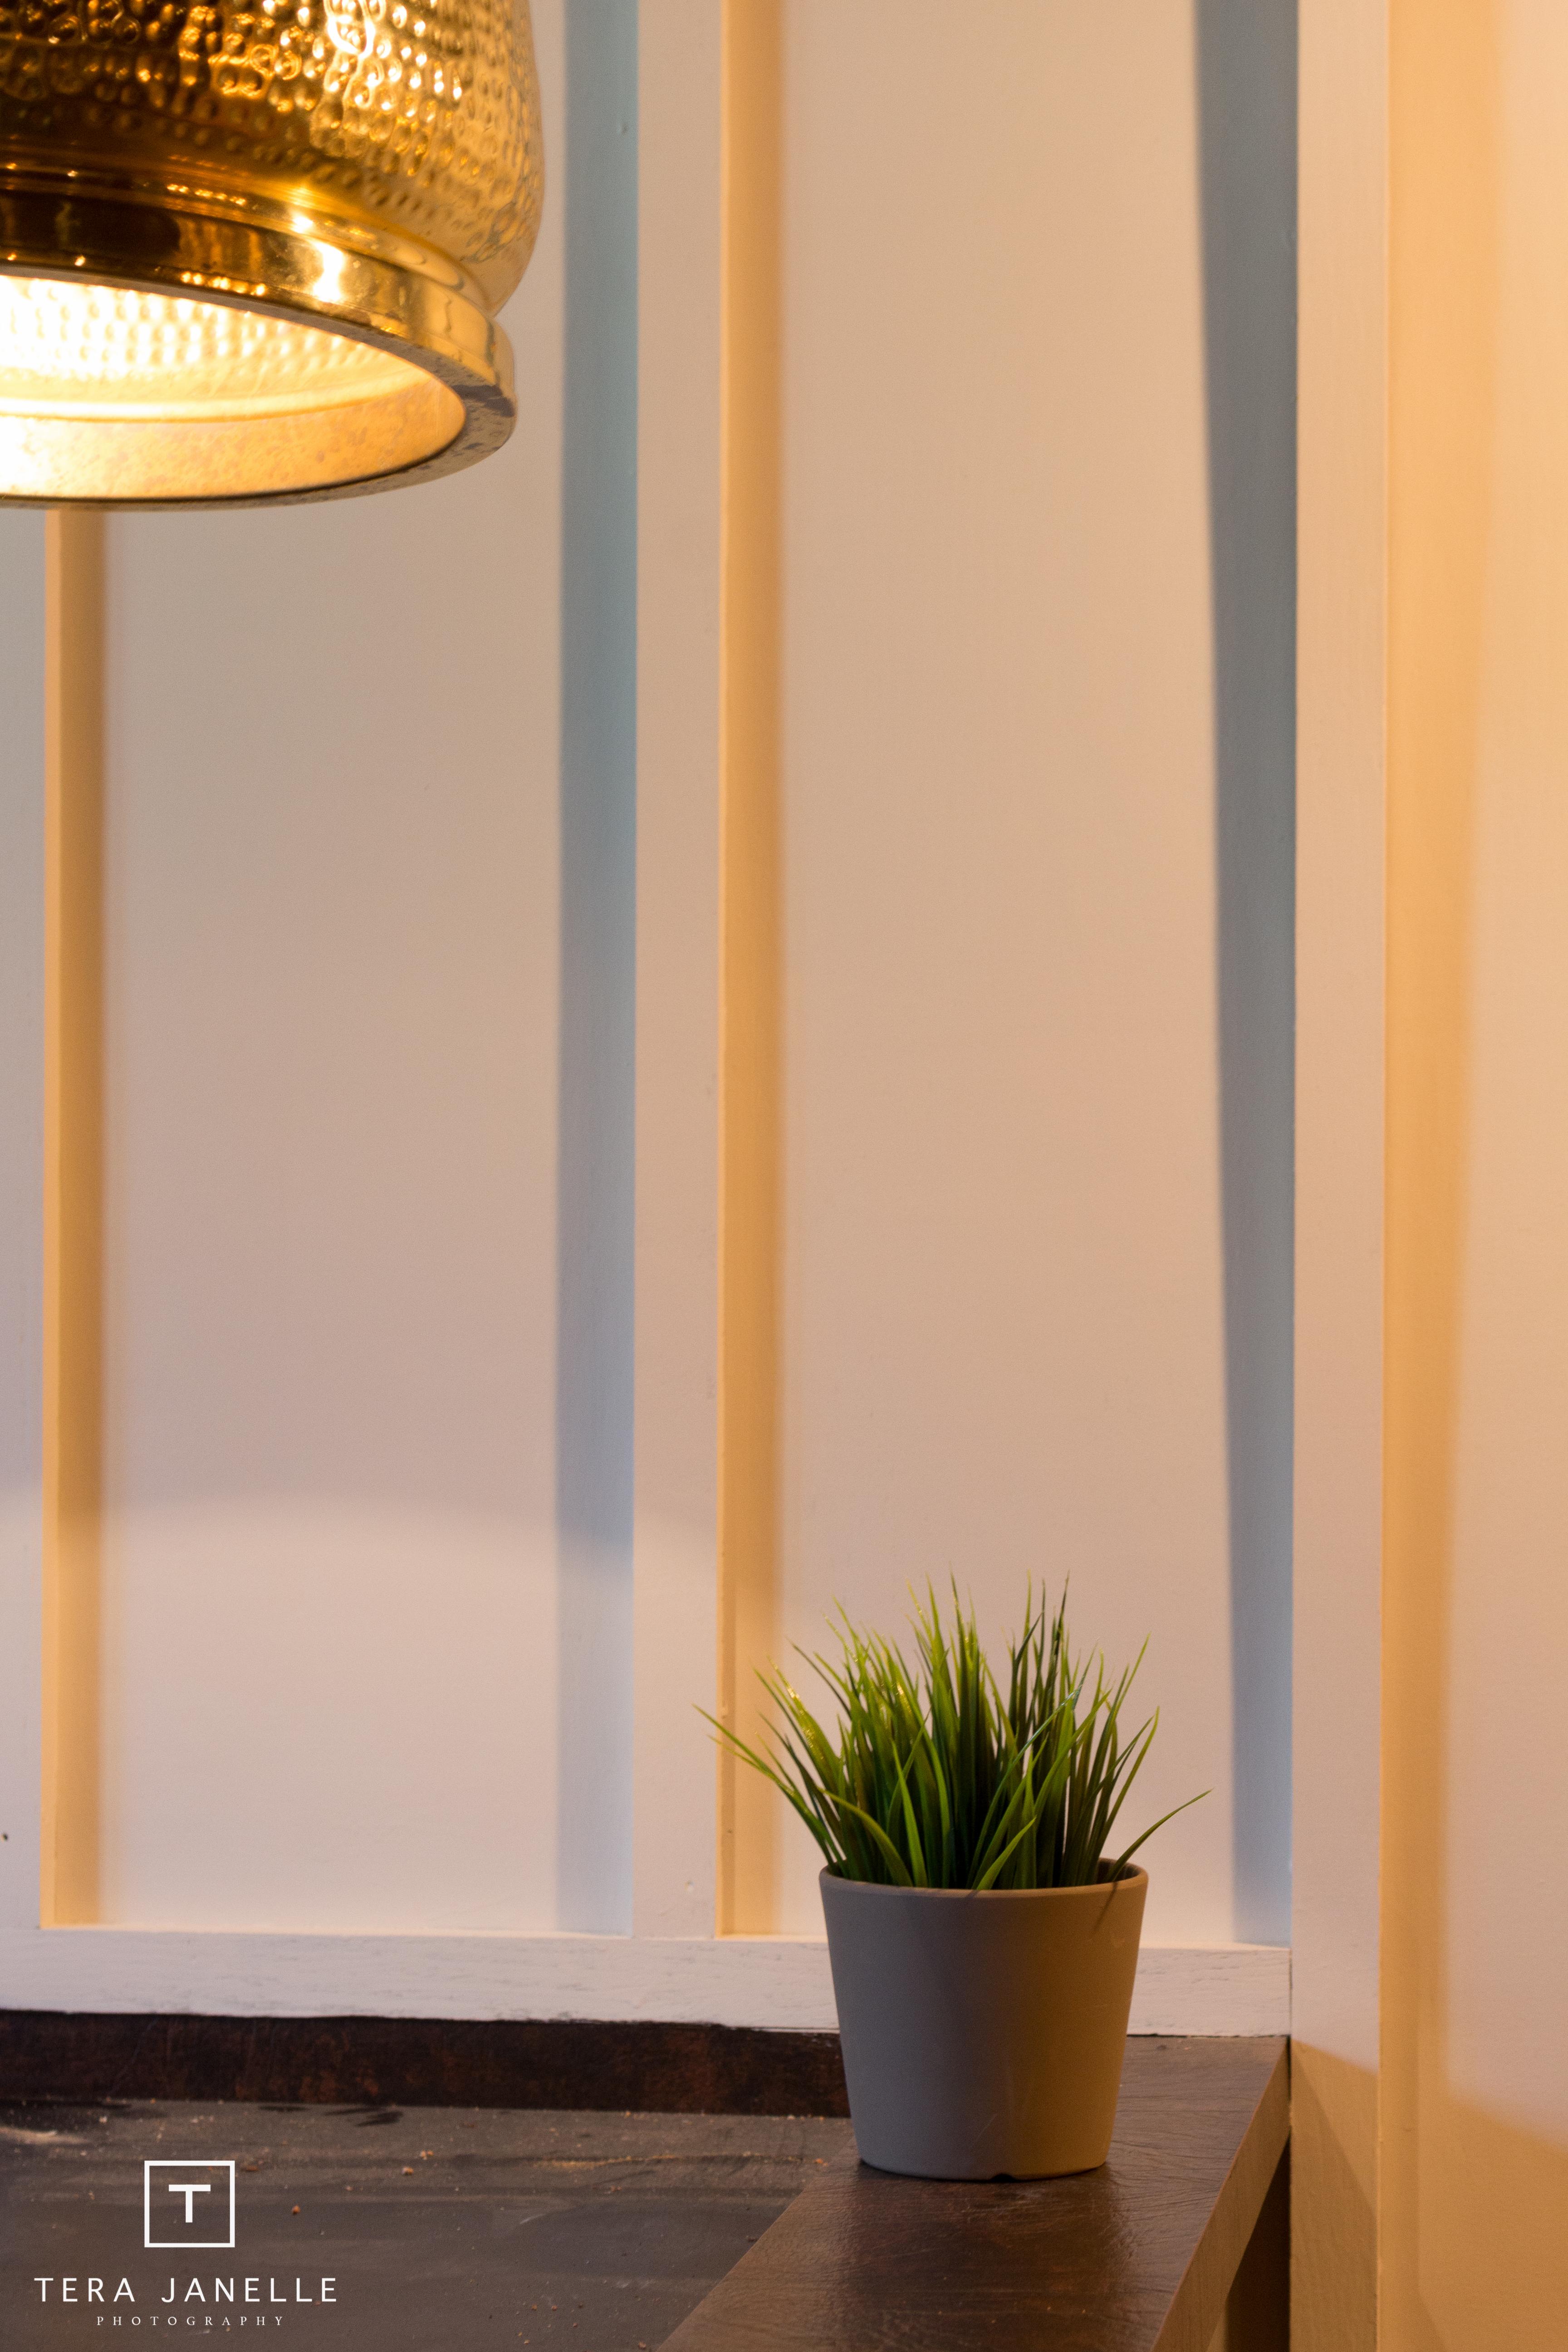 Design House - In Progress - Watermark-20.jpg